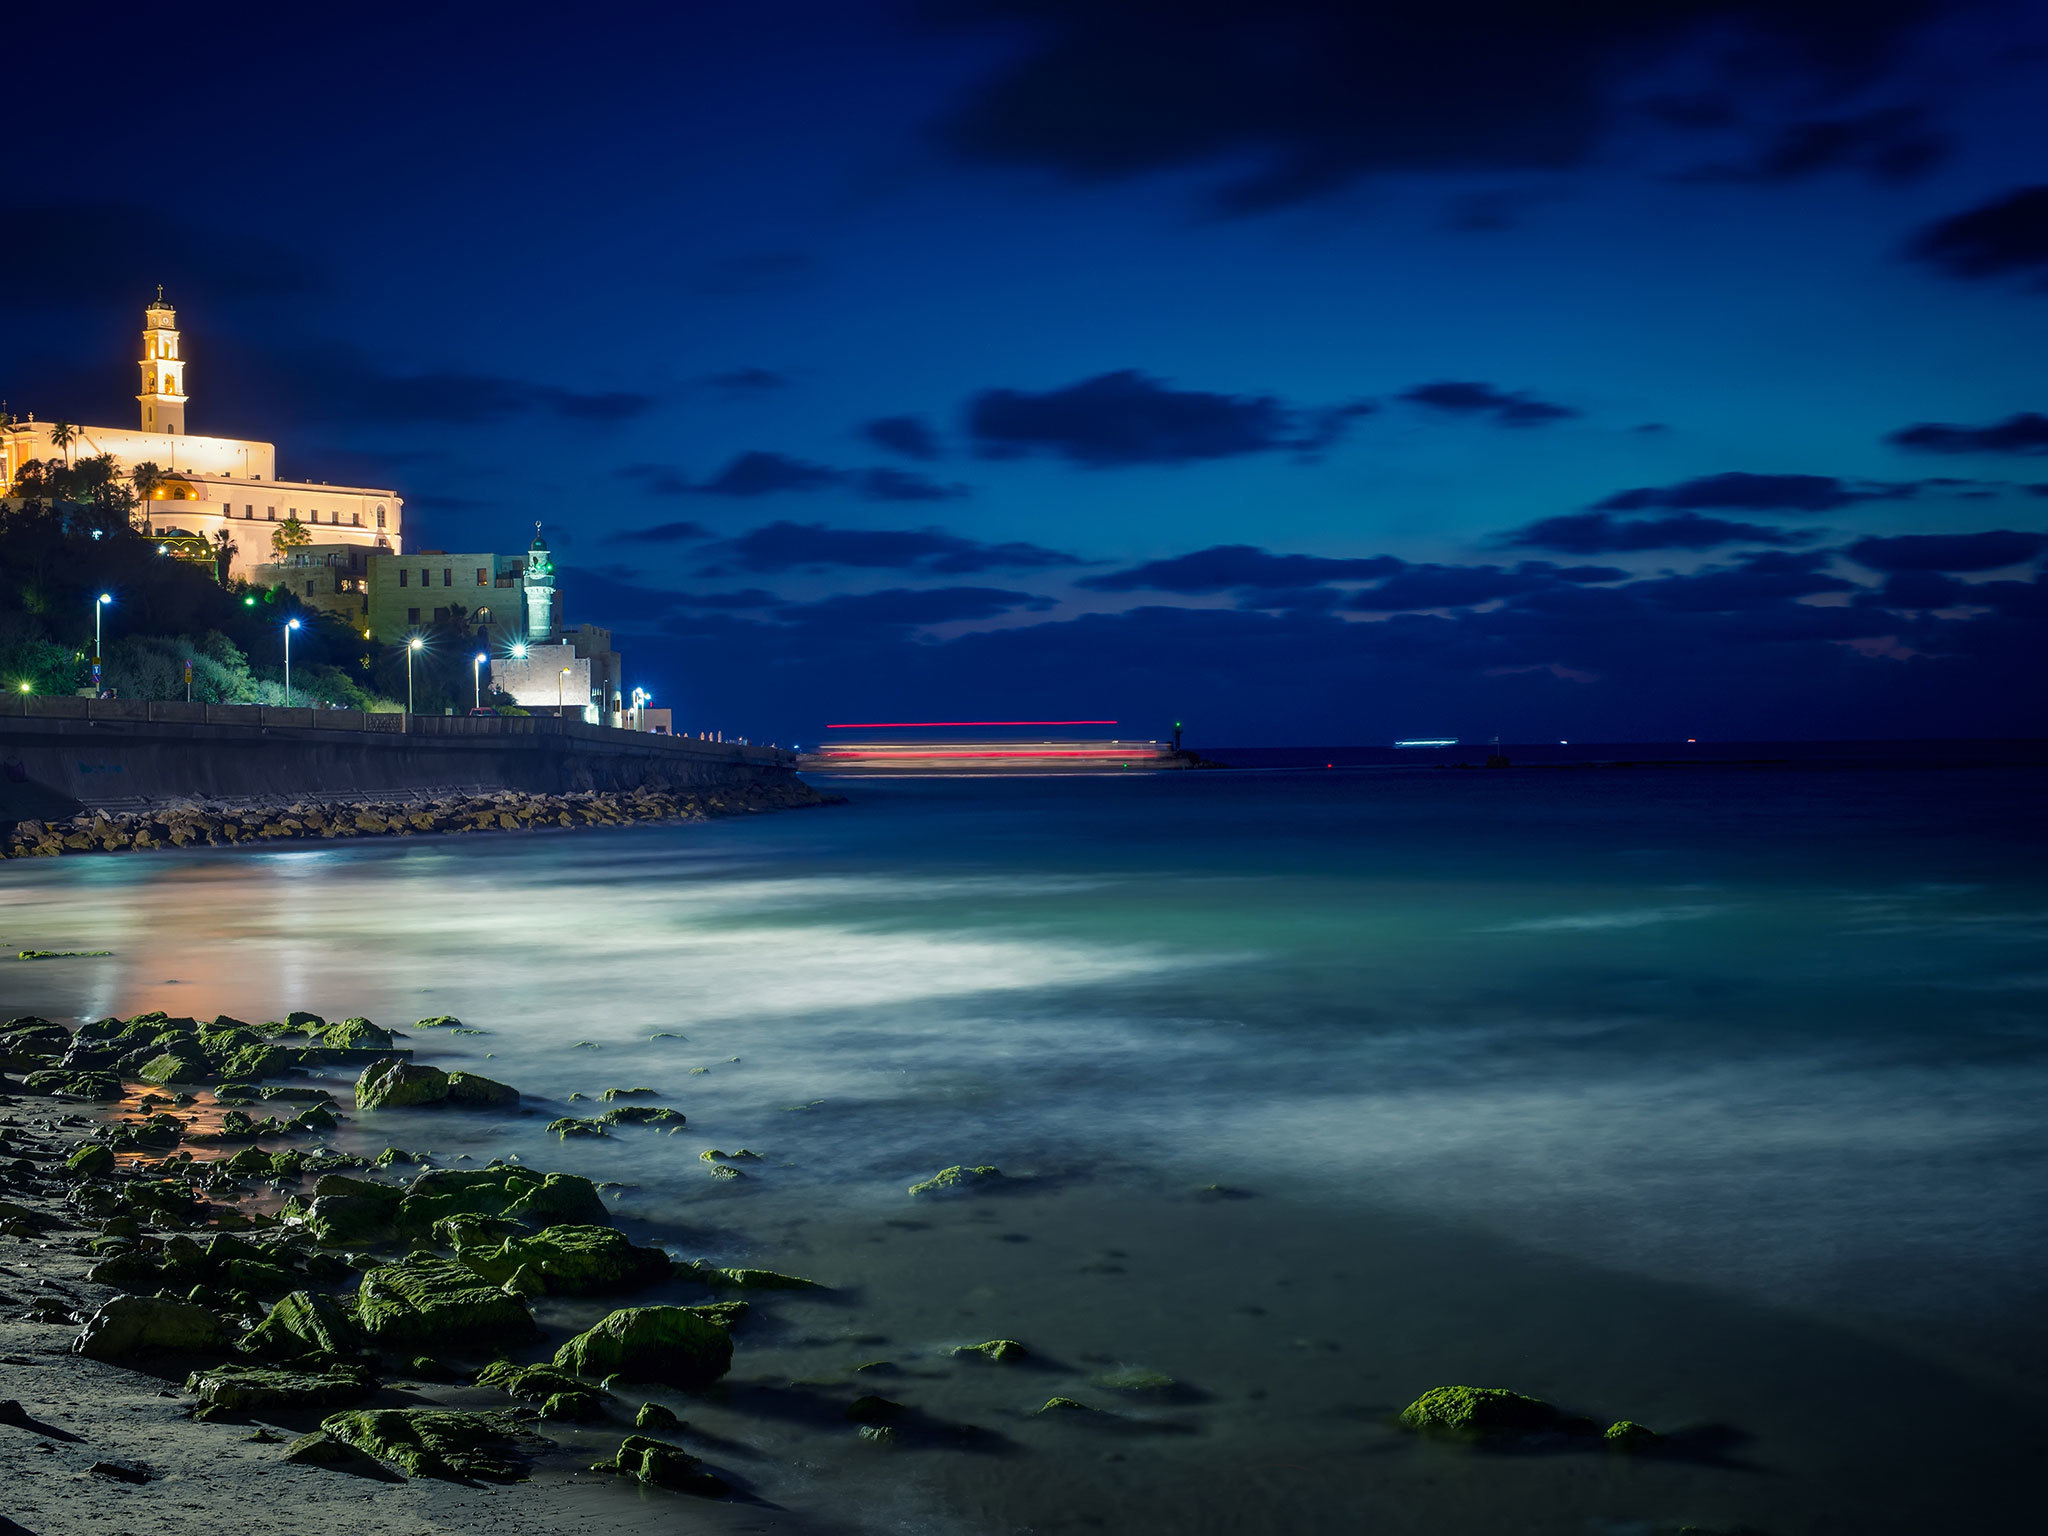 Old City of Jaffa